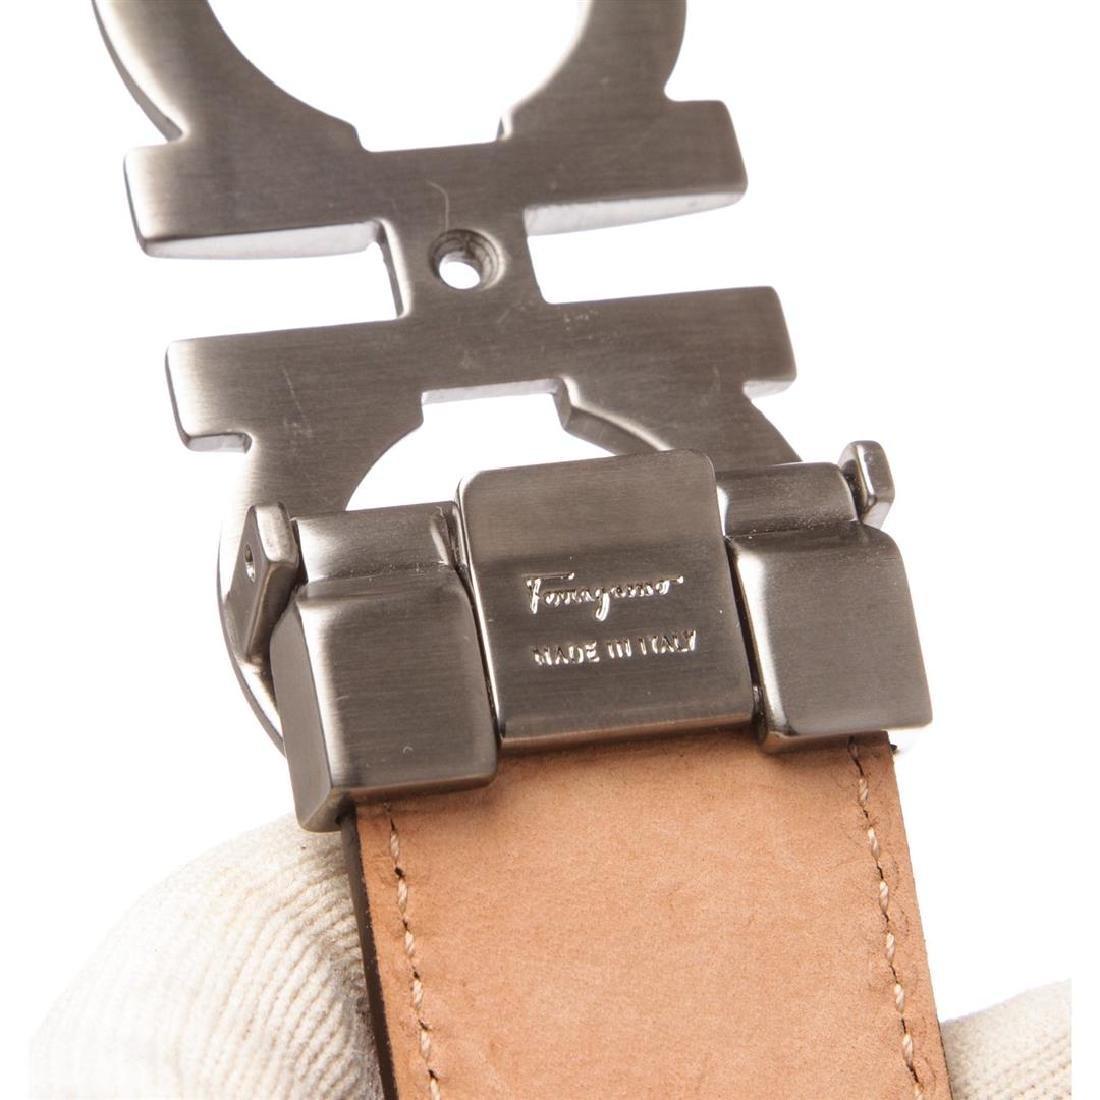 Salvatore Ferragamo Gancini Brown Leather Belt - 6